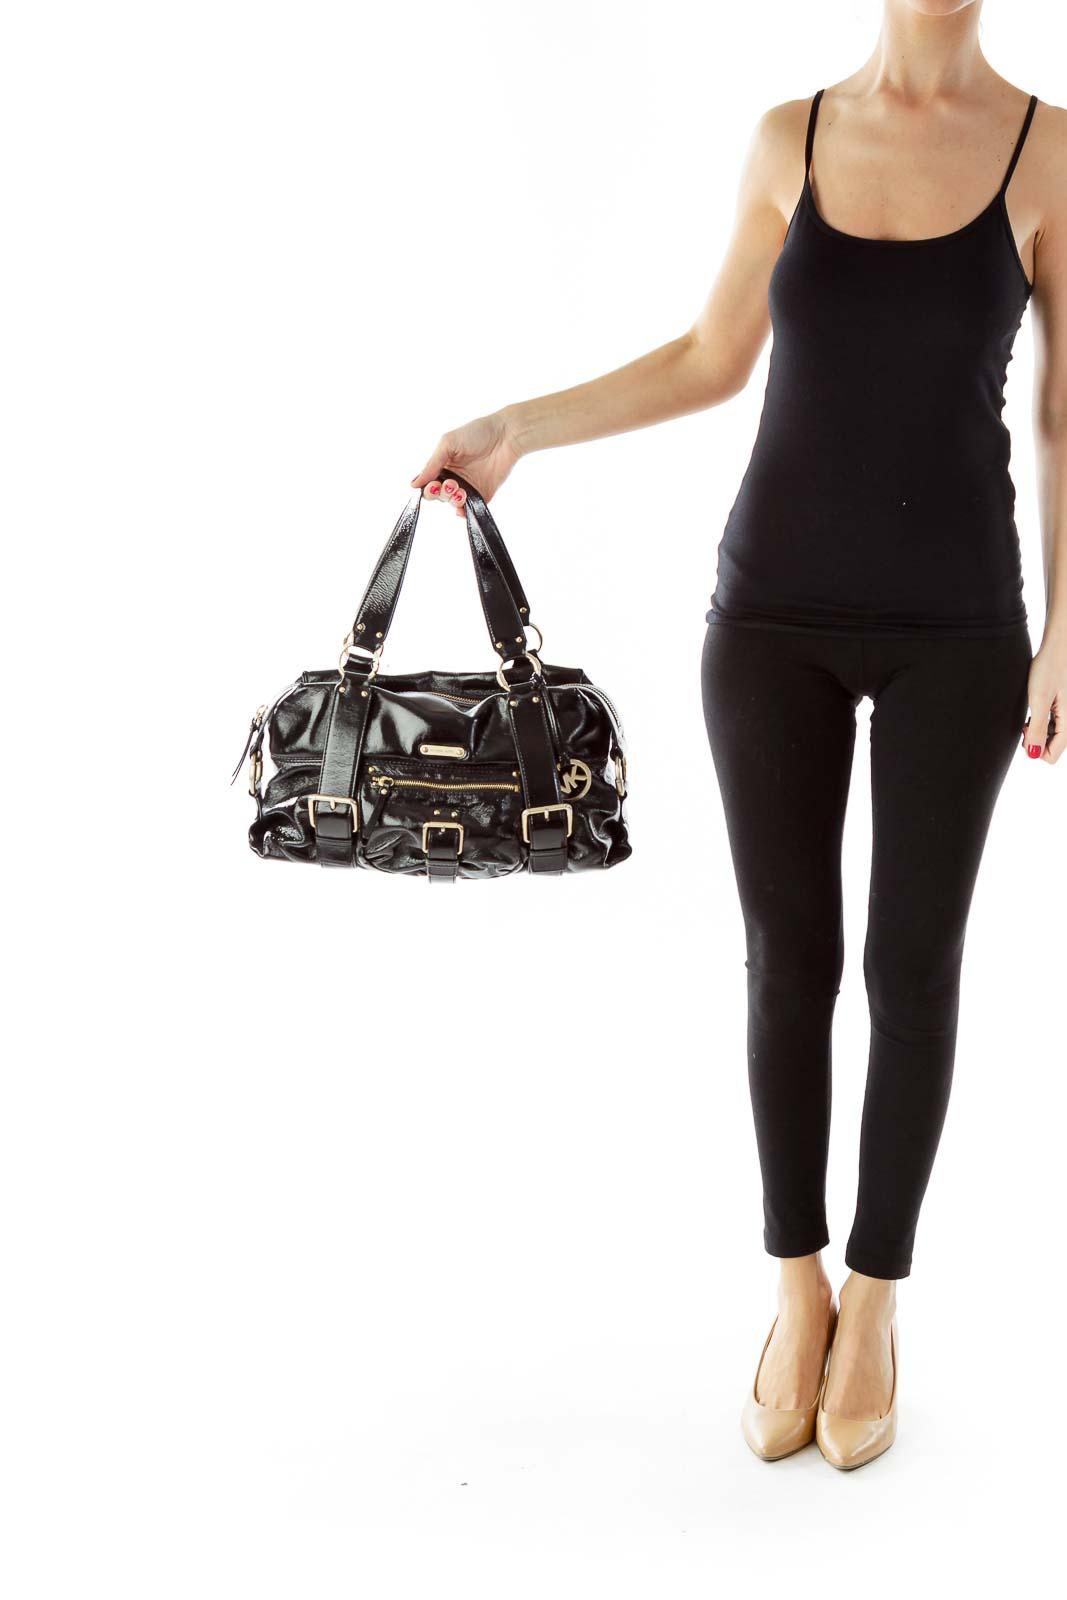 85913e8de93 Shop Michael Michael Kors clothing and handbags at SilkRoll. Trade ...